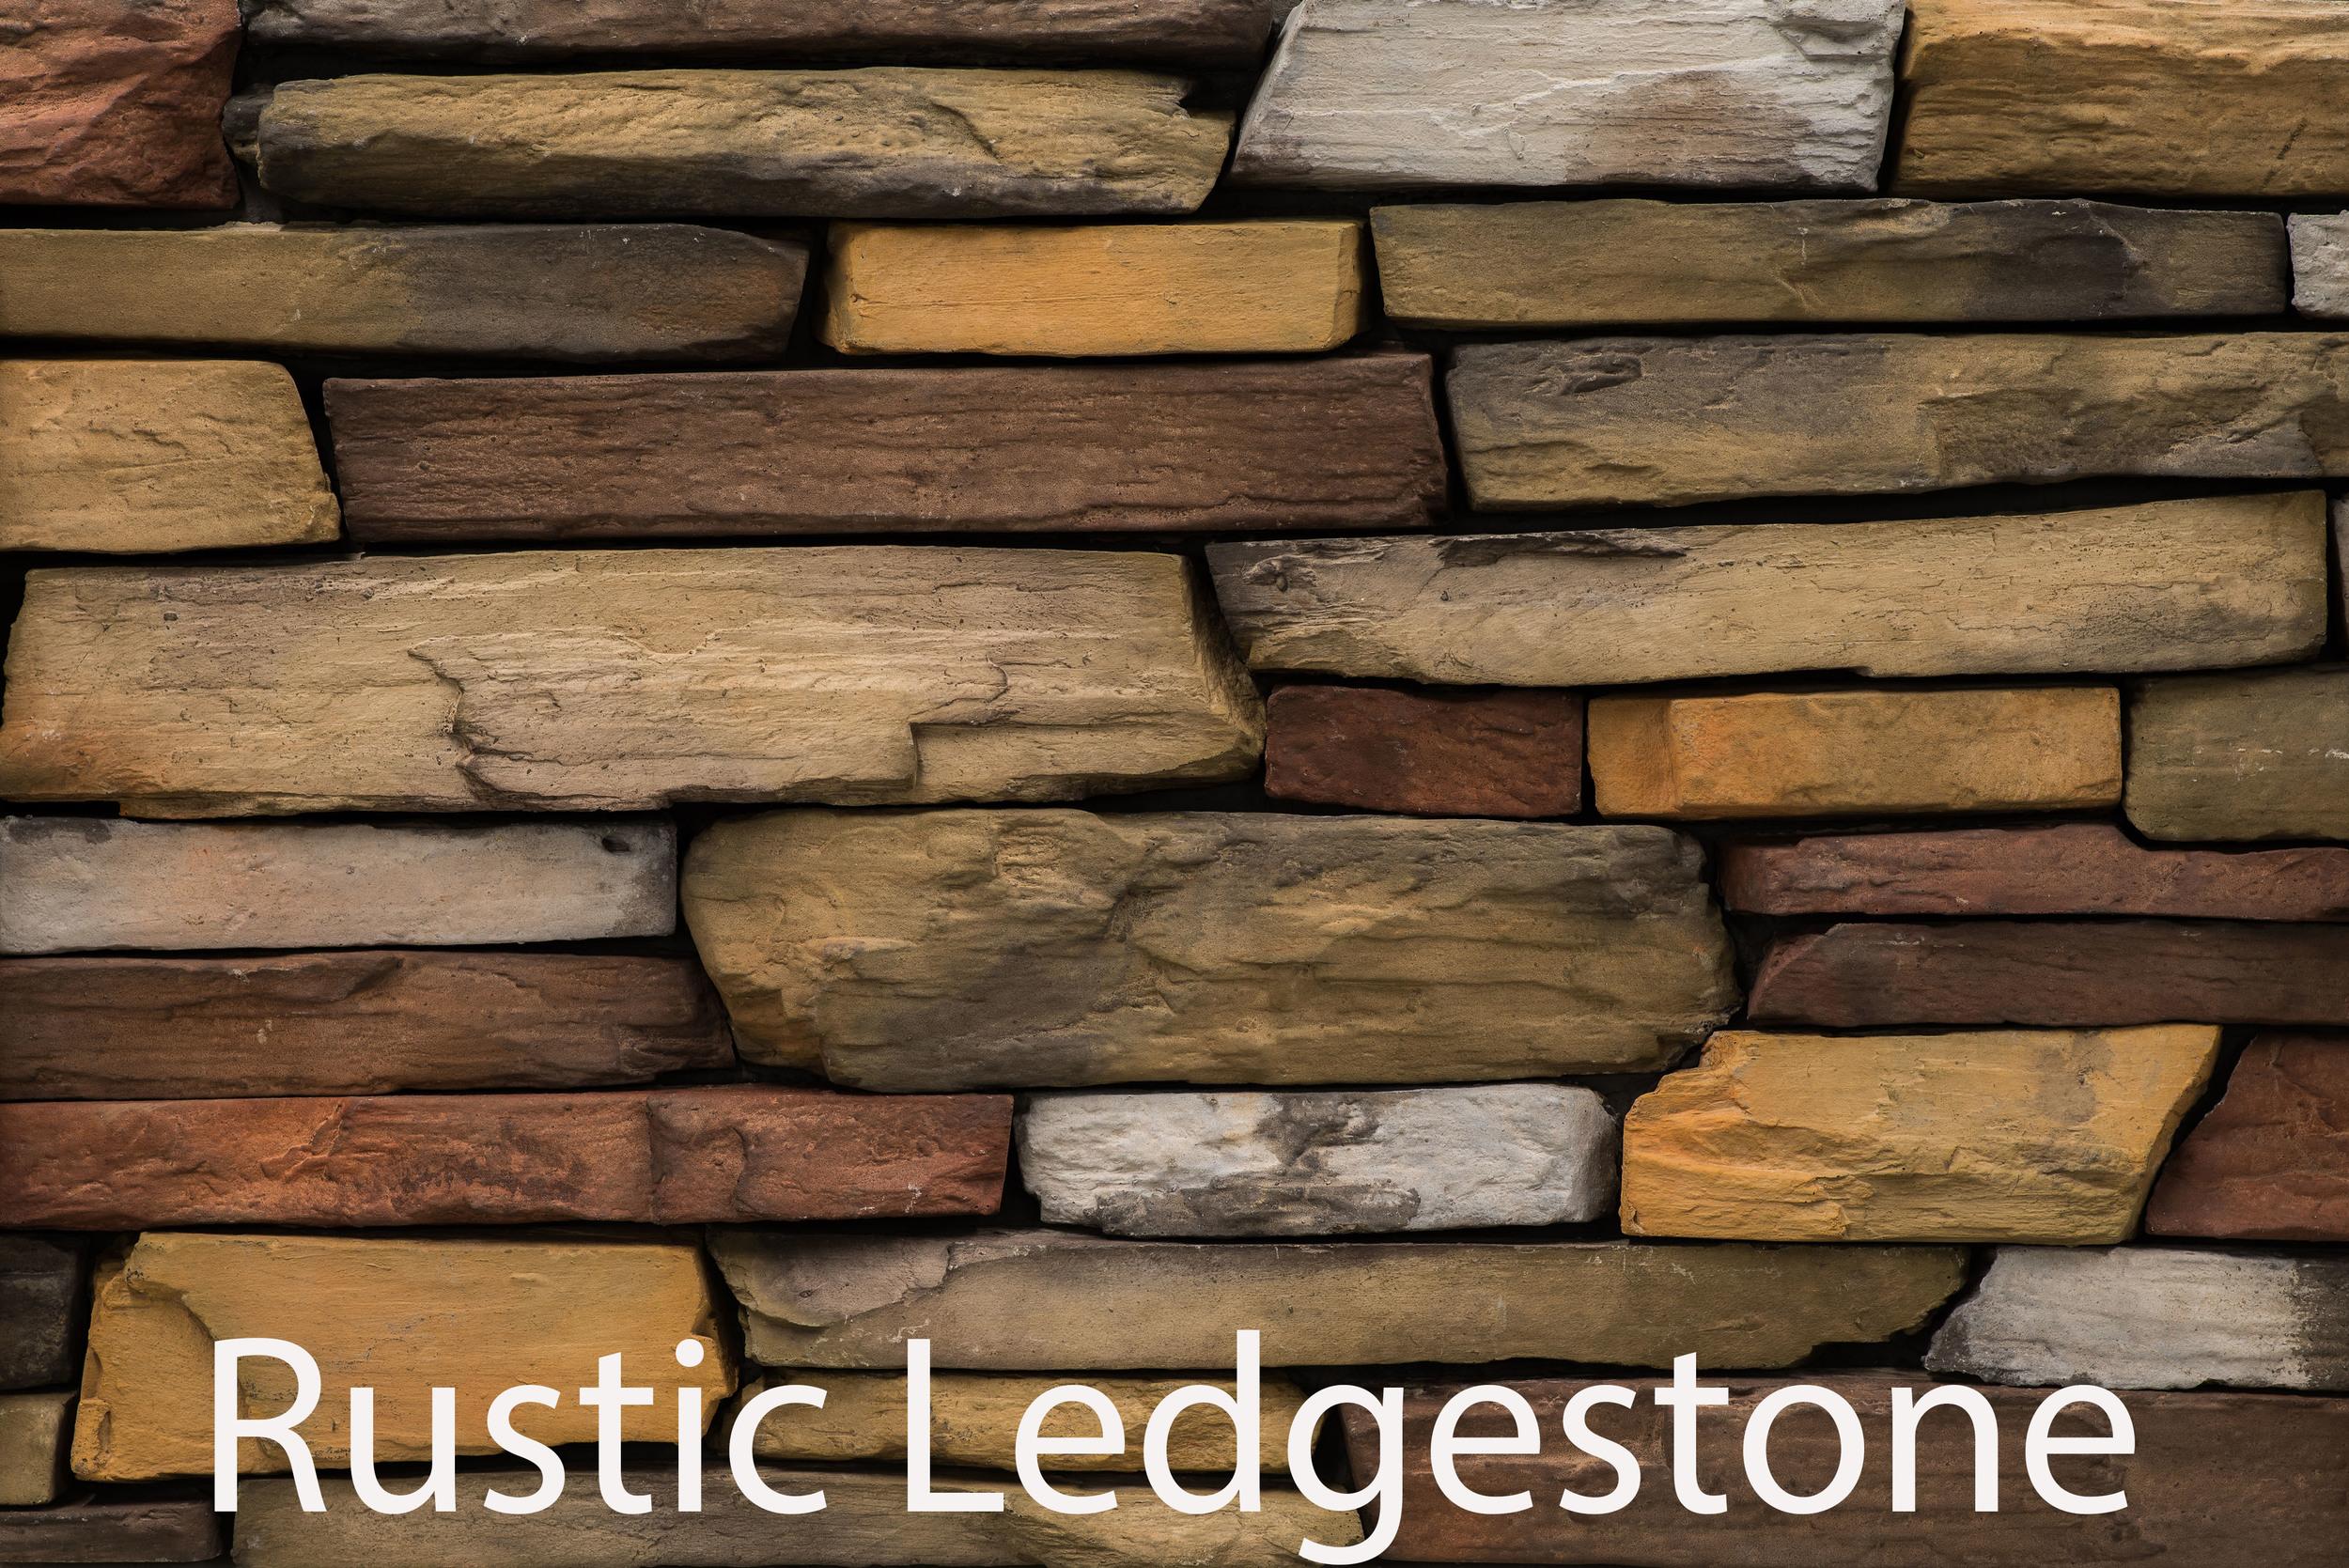 Rustic Ledgestone - Bonner County